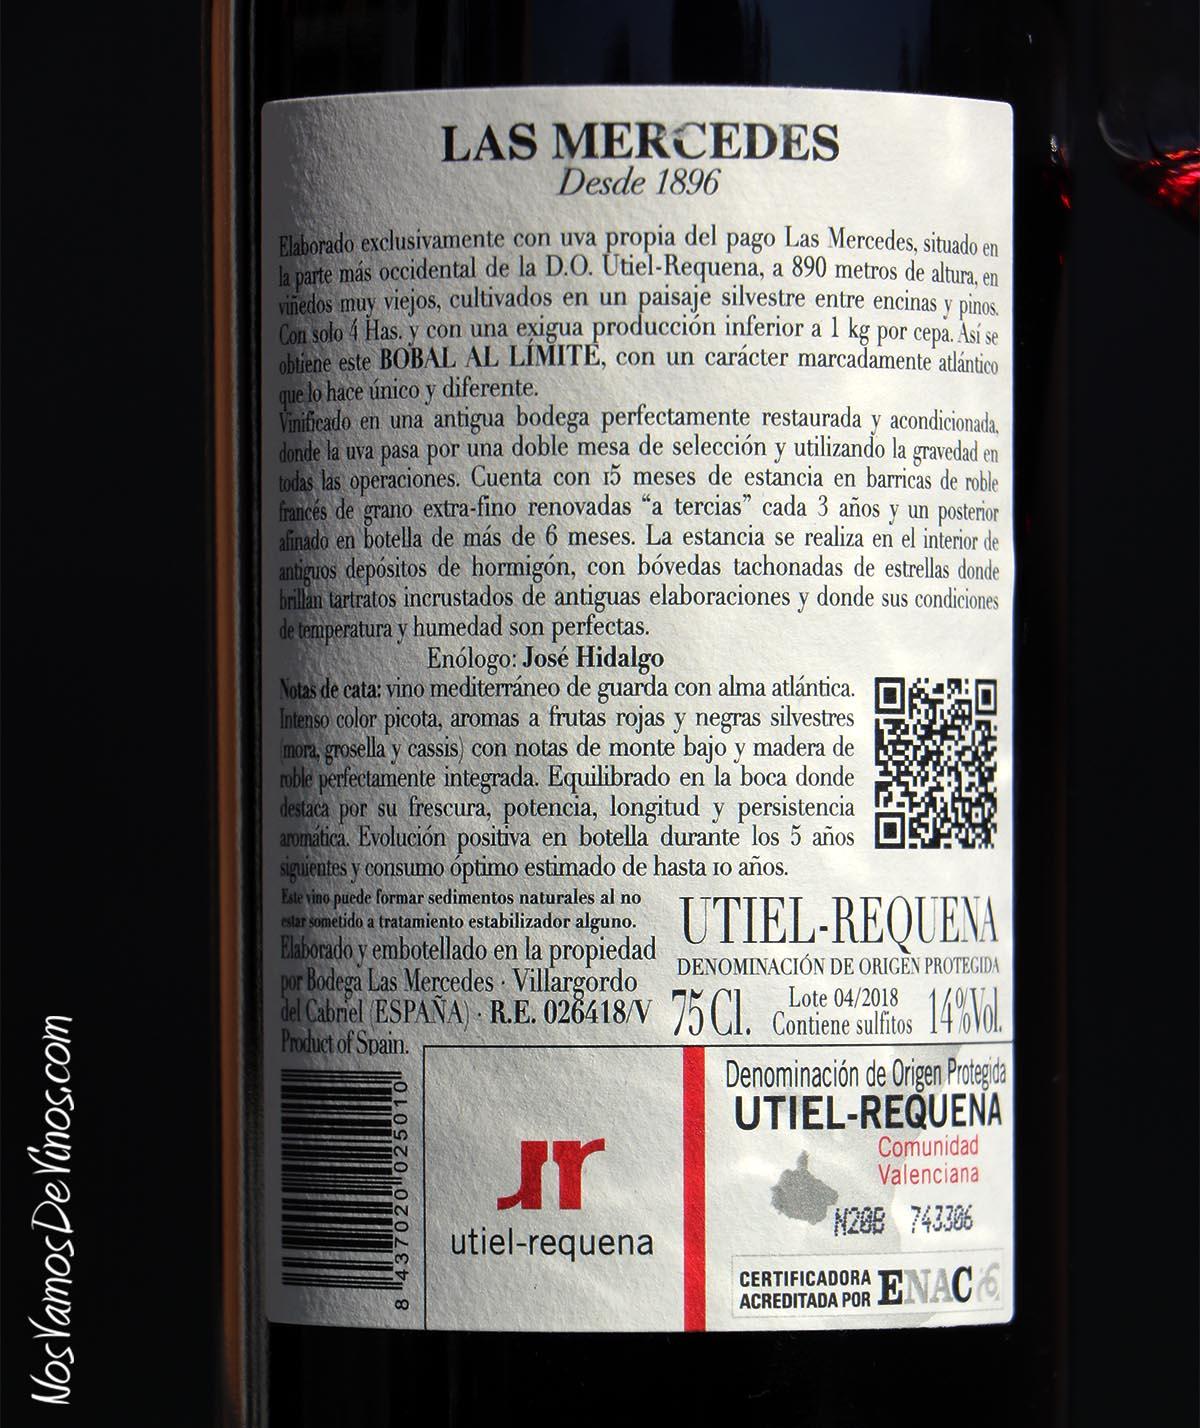 Mercedes del Cabriel Bobal al Límite 2018 Trasera